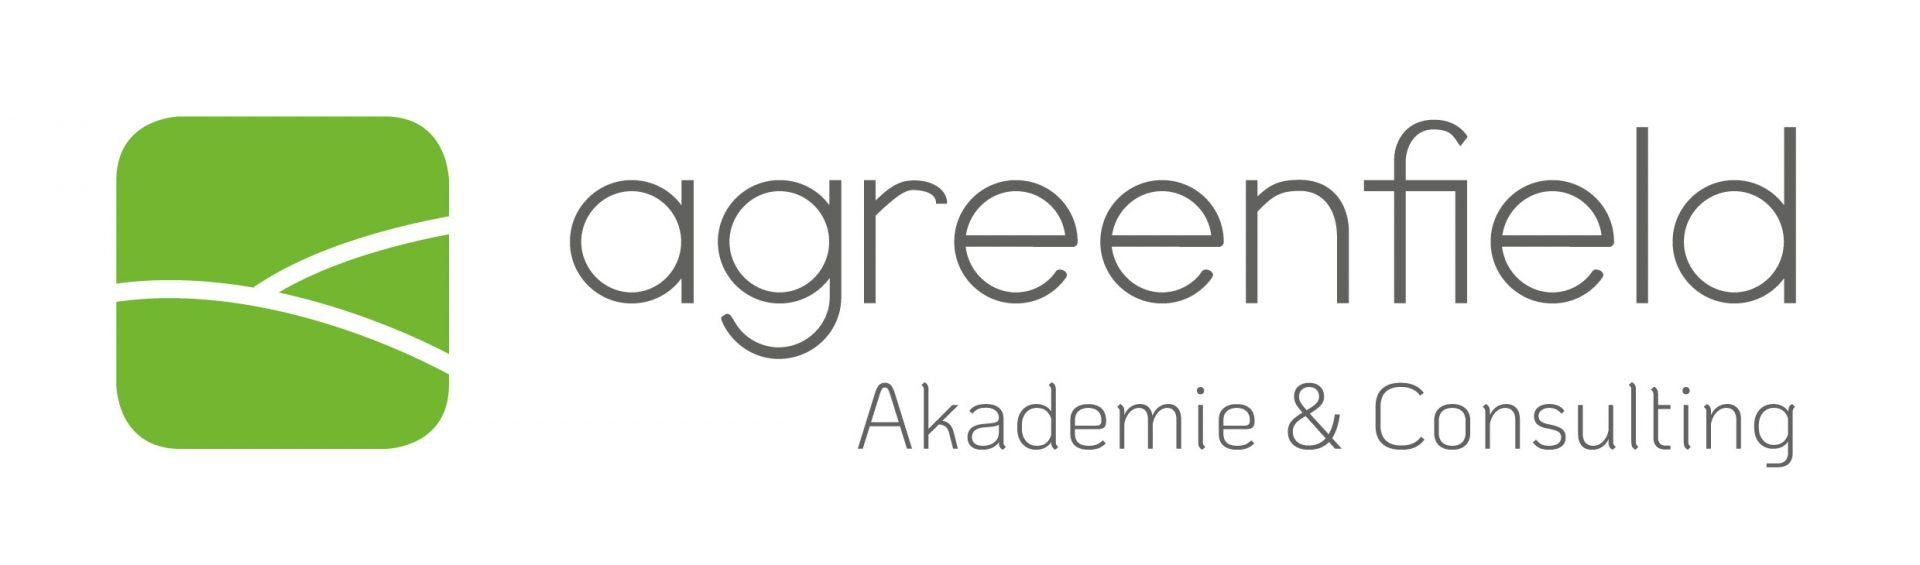 agfa_logo_academieconsulting_rgb_300dpi